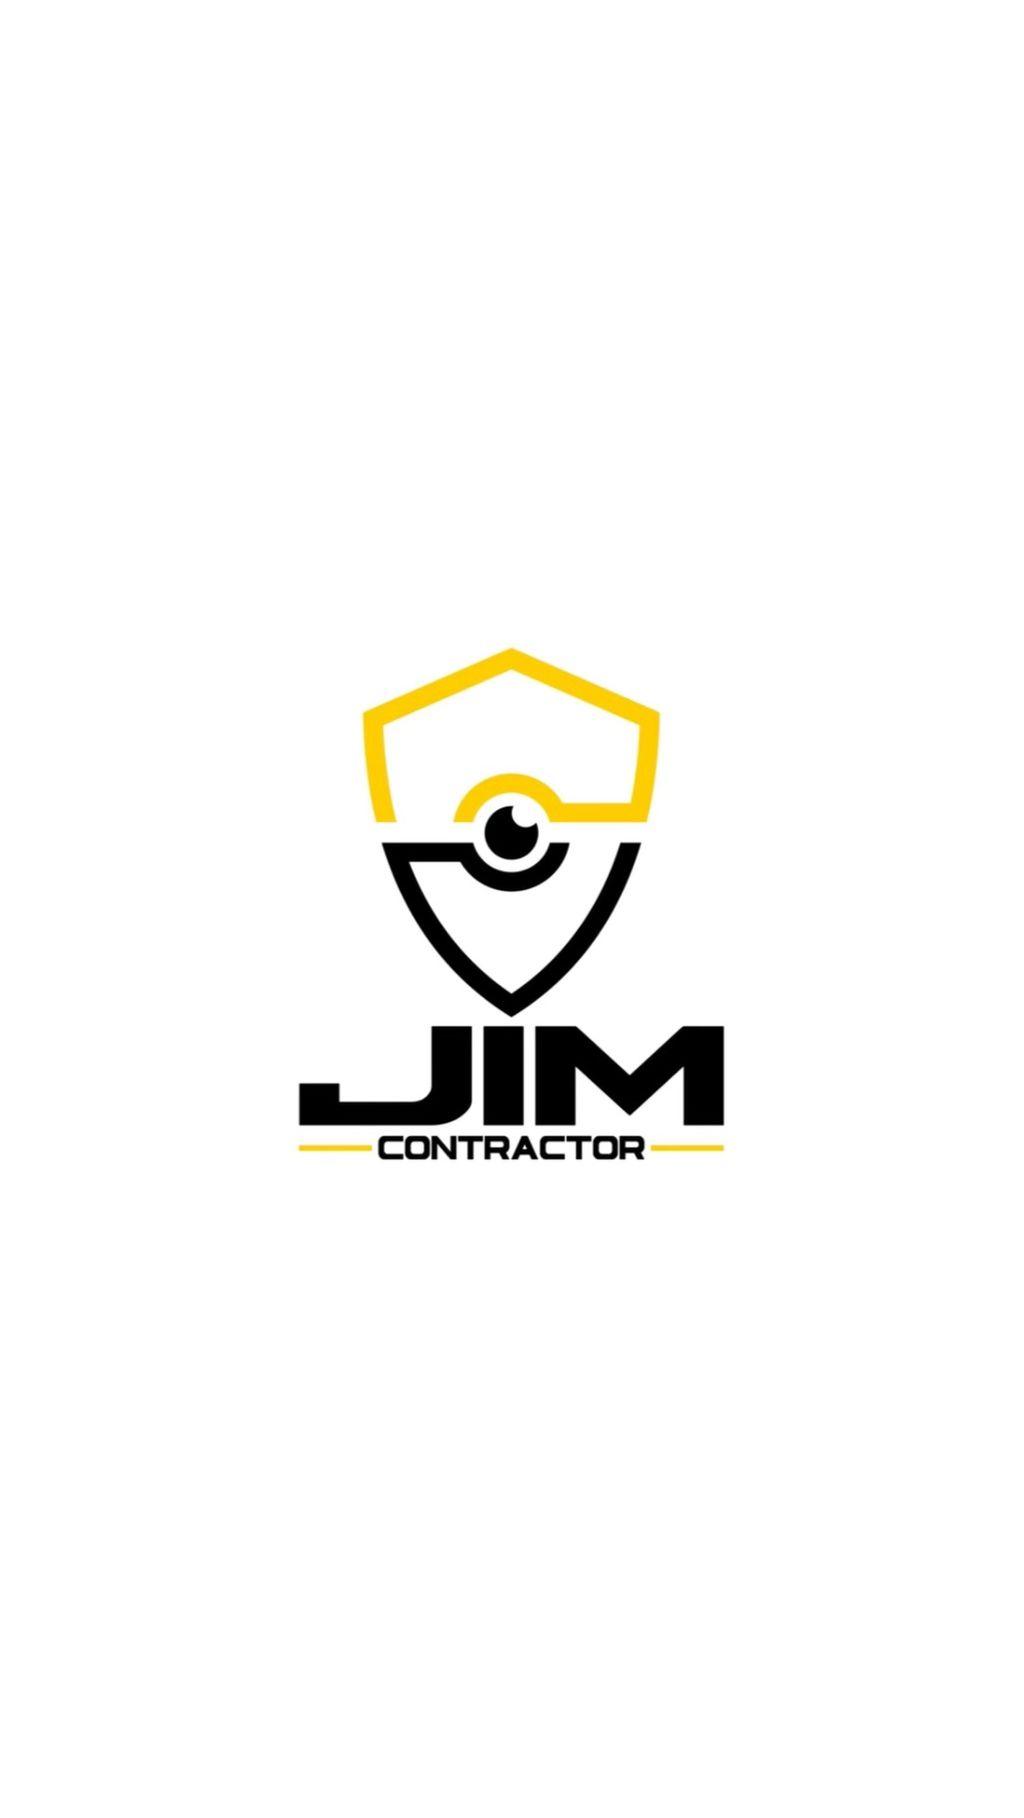 JIM CONTRACTOR INC